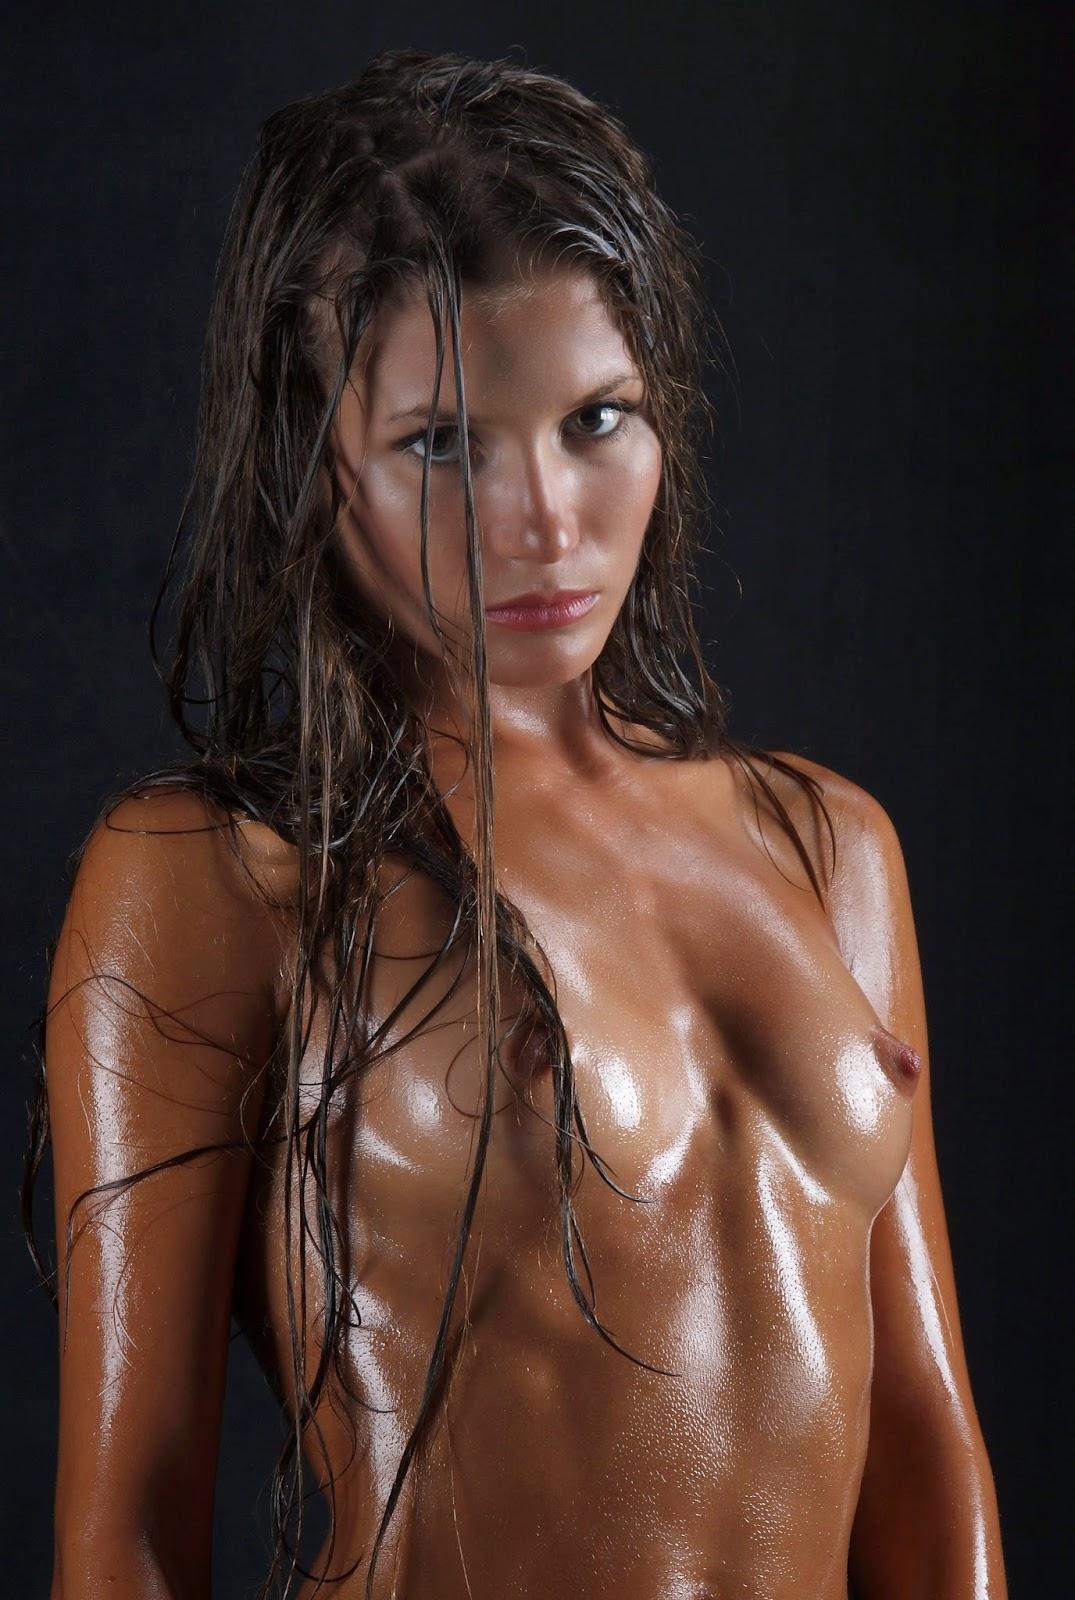 Alpha Male Breeding Porn Captions - Body impregnation breeding captions xxx - Impregnation erotica march jpg  1075x1600